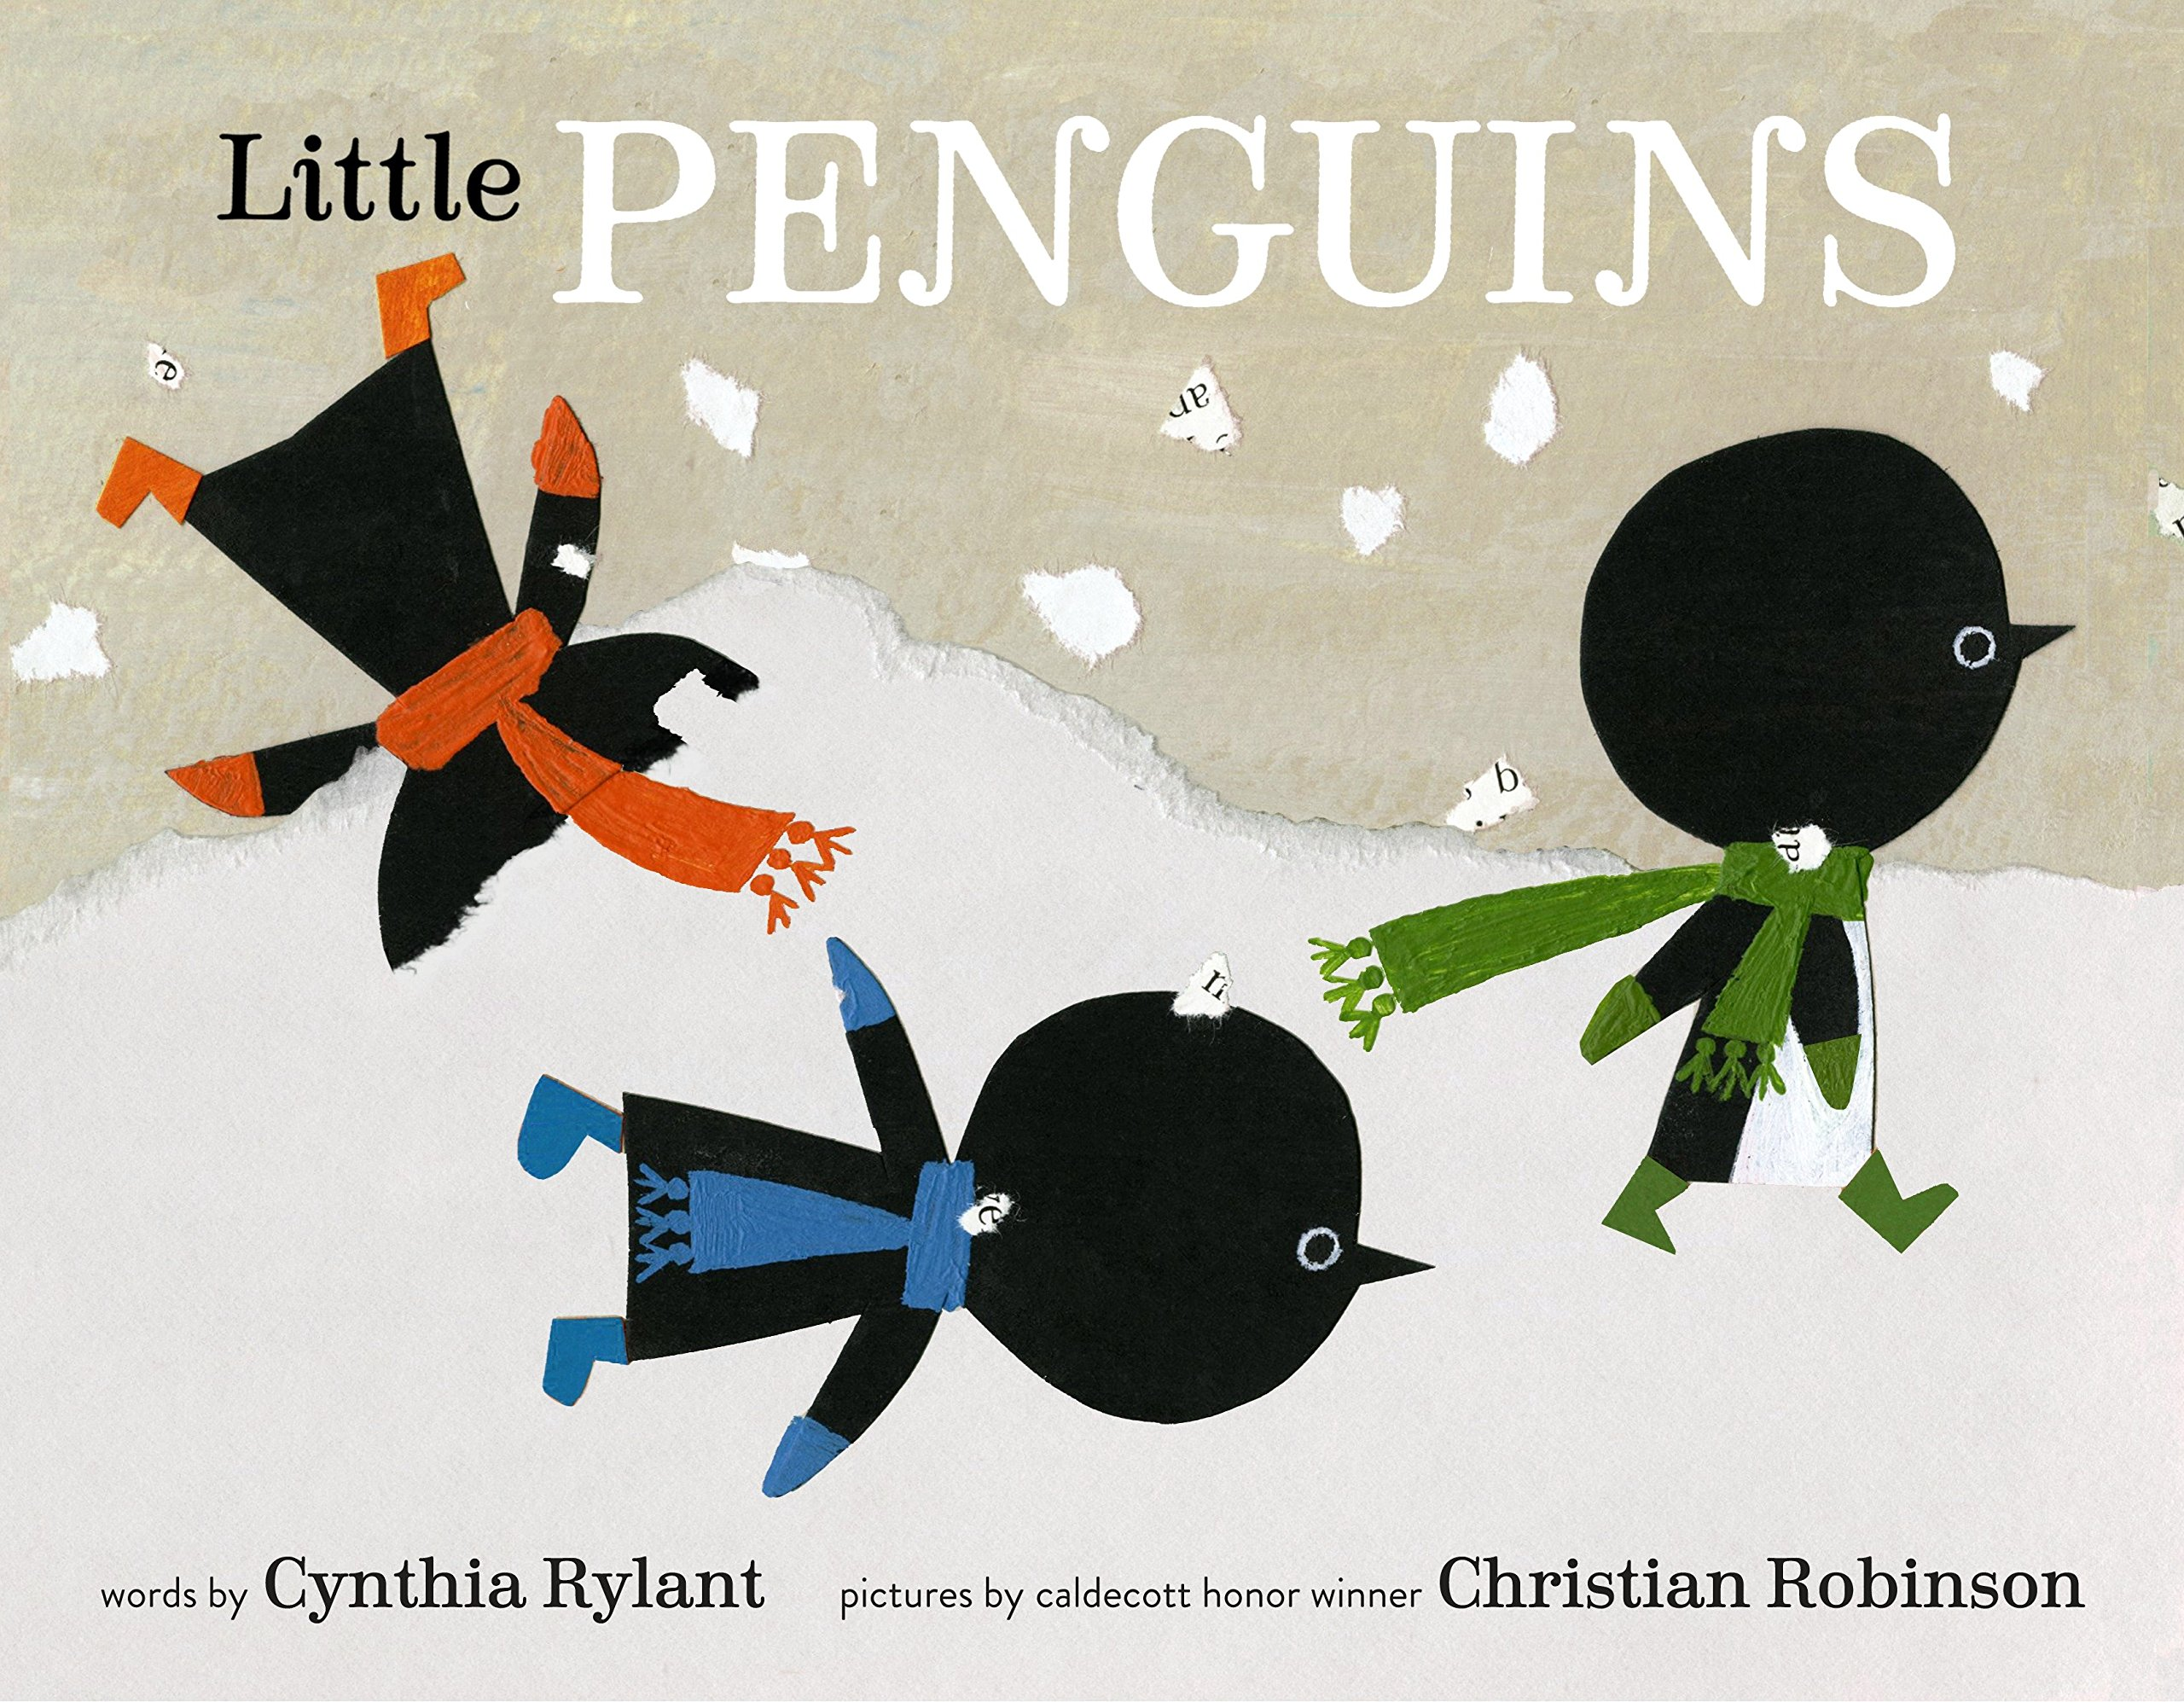 Amazon.com: Little Penguins (9780553507706): Rylant, Cynthia, Robinson, Christian: Books